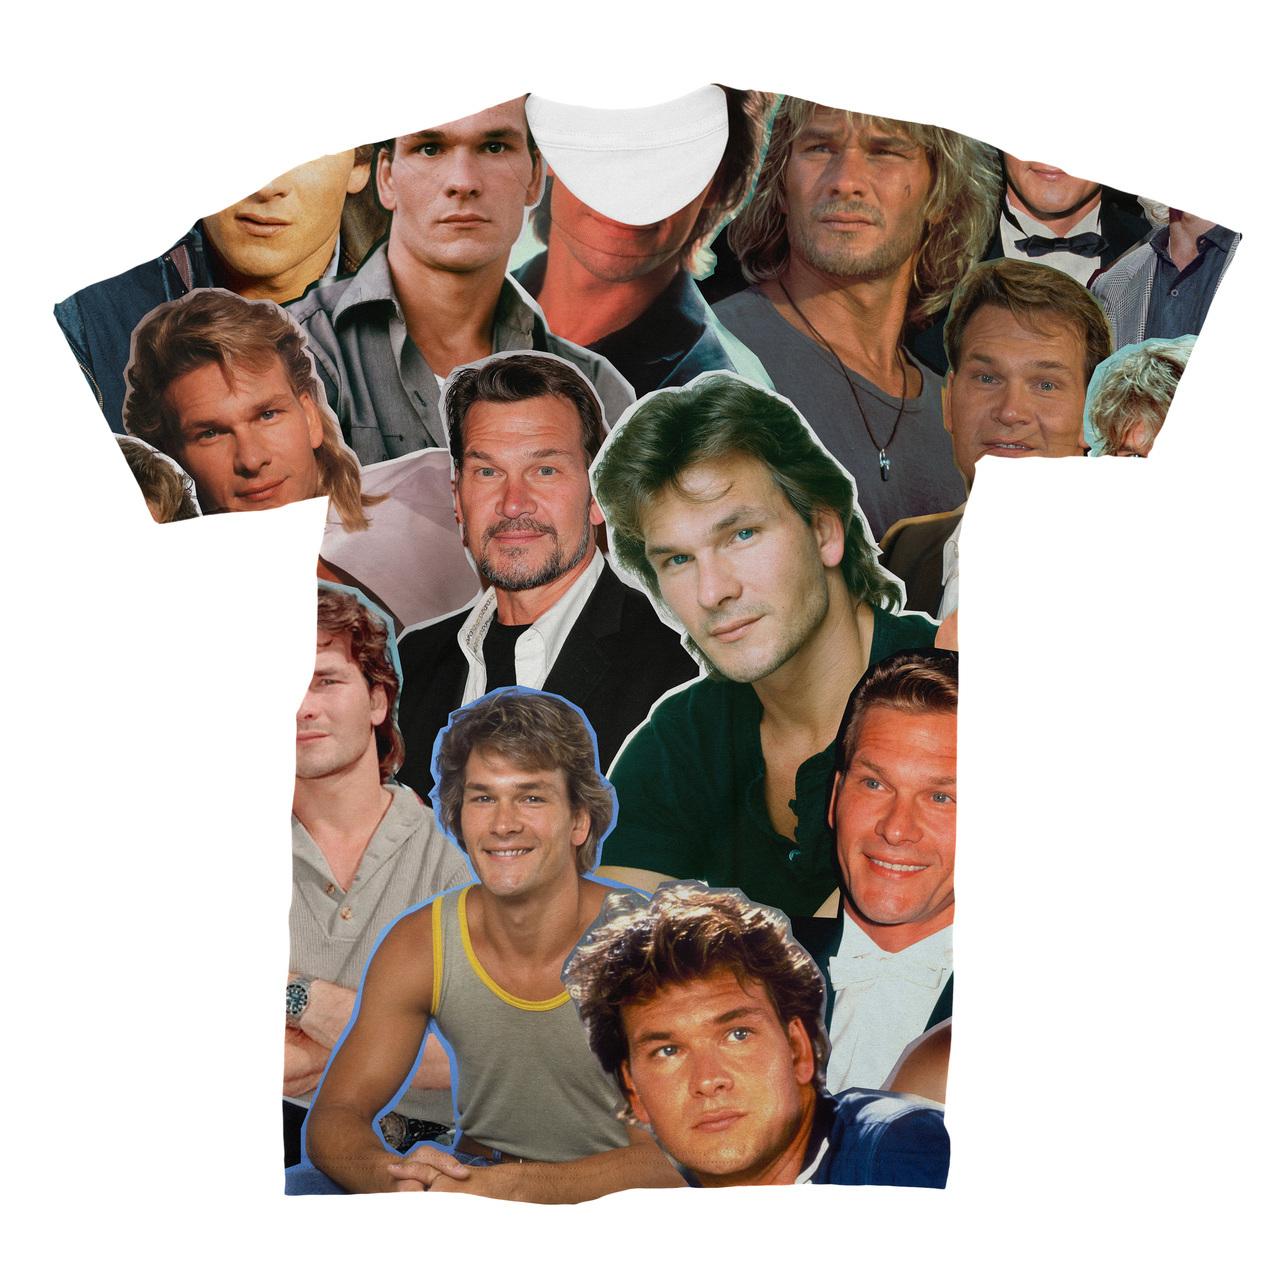 75287075f7d67 Patrick Swayze Photo Collage T-Shirt - Subliworks